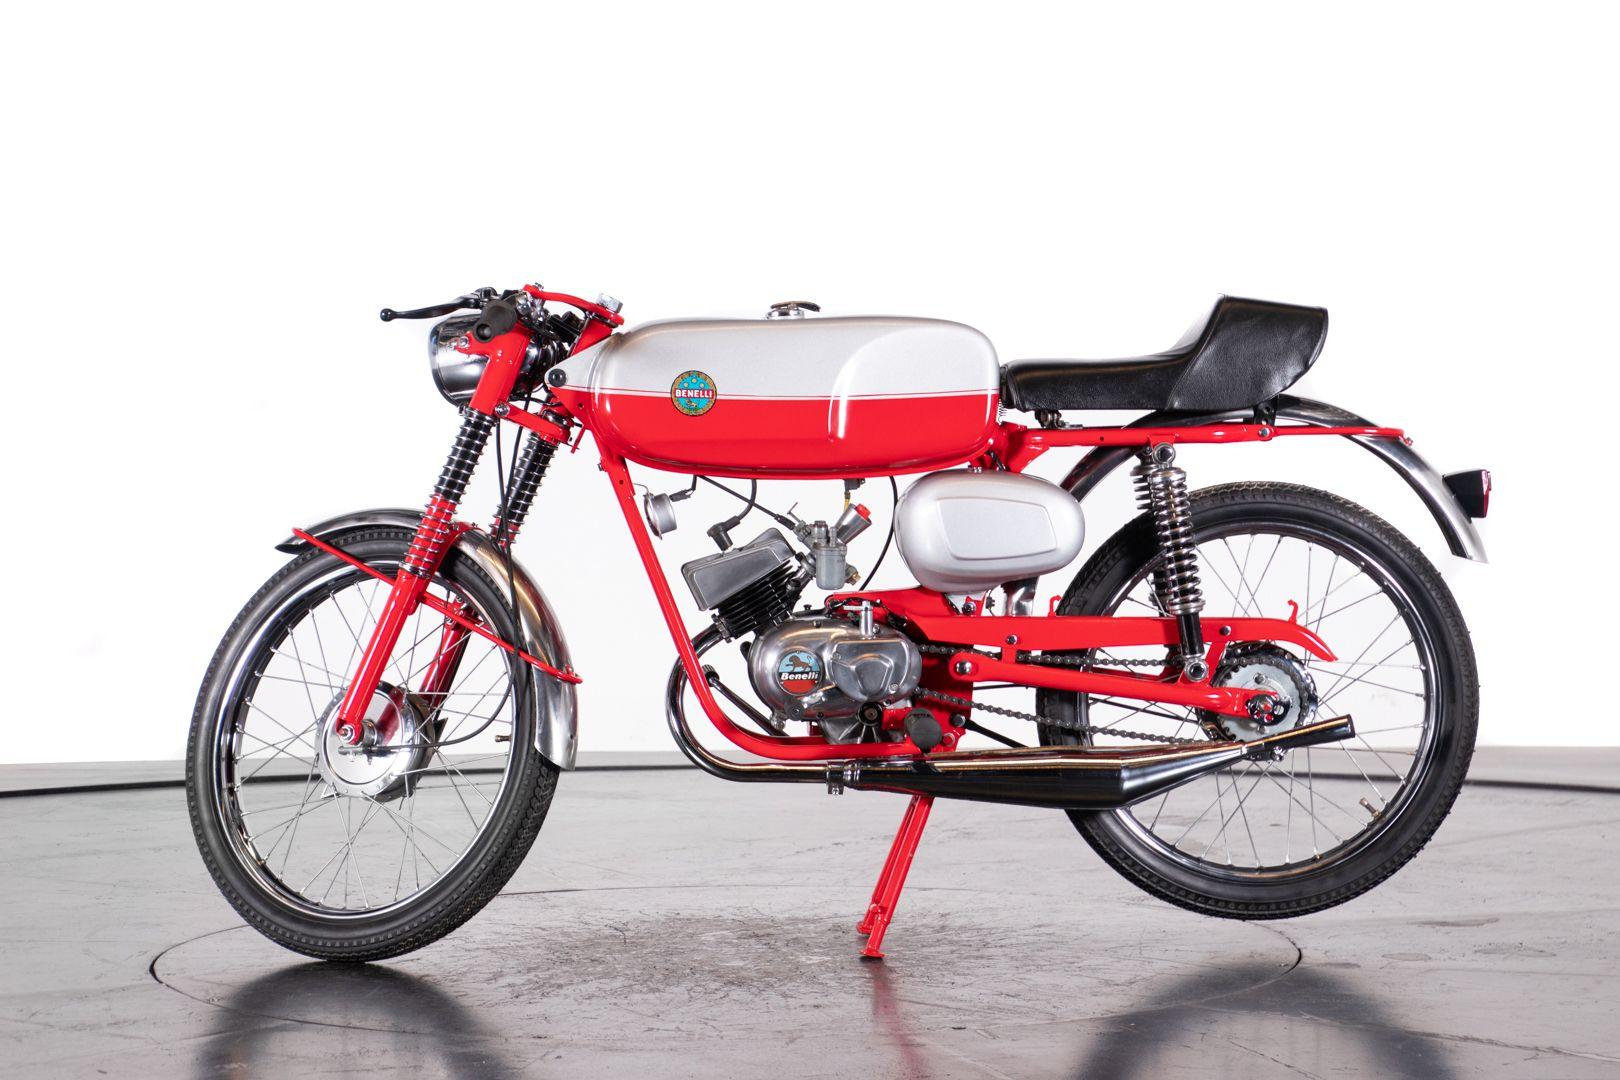 1965 BENELLI 50 CC 52126